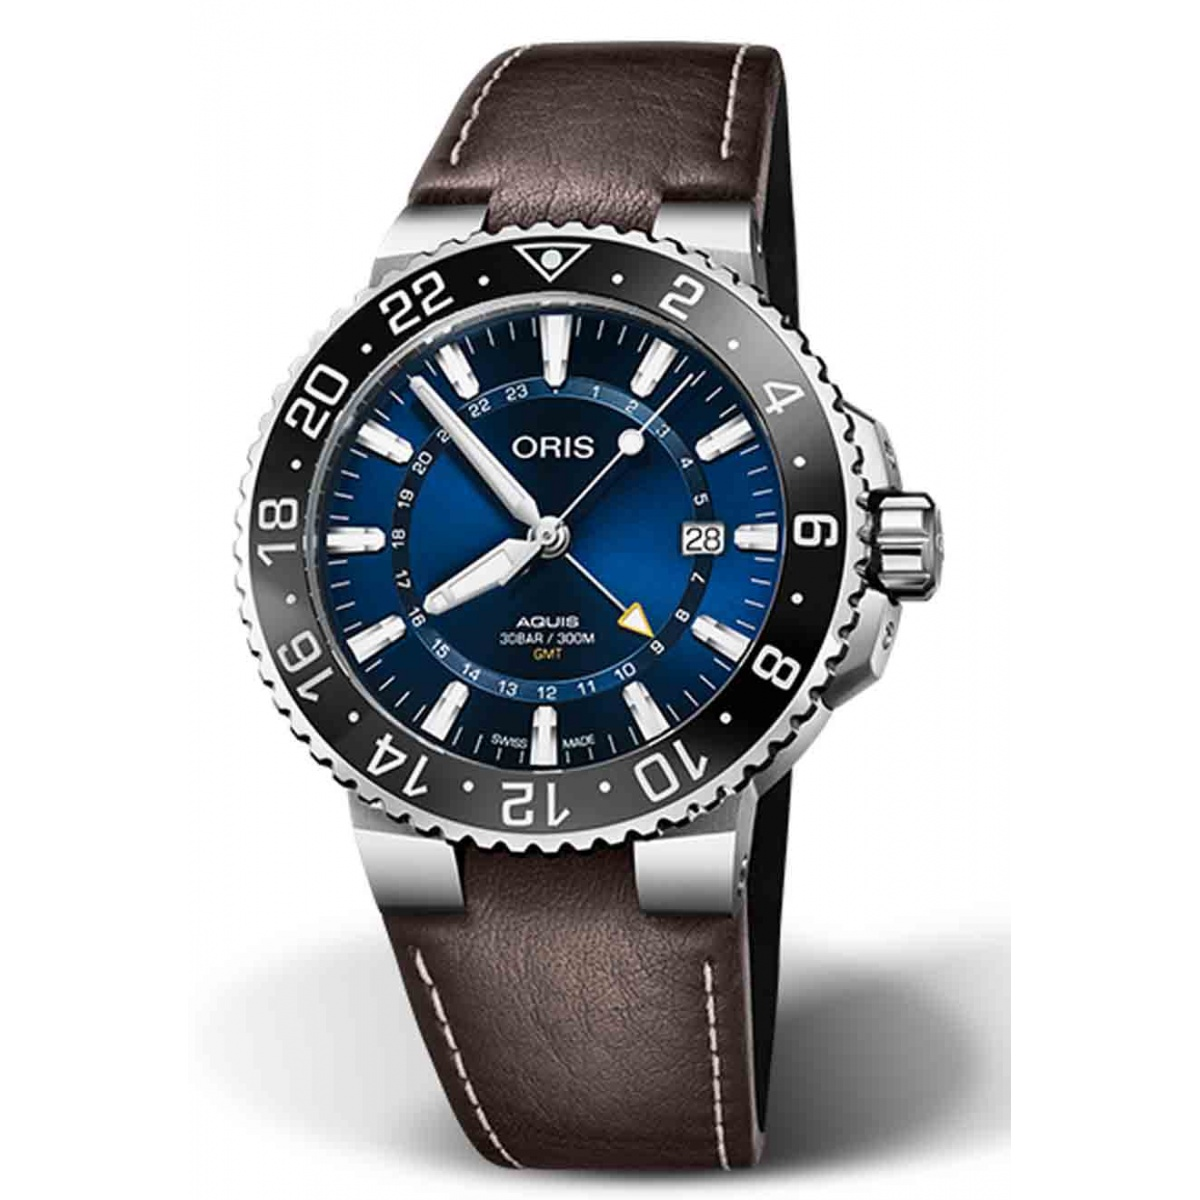 ORIS AQUIS GMT DATE 300 M ∅43,5 mm, Esfera azul, piel marrón